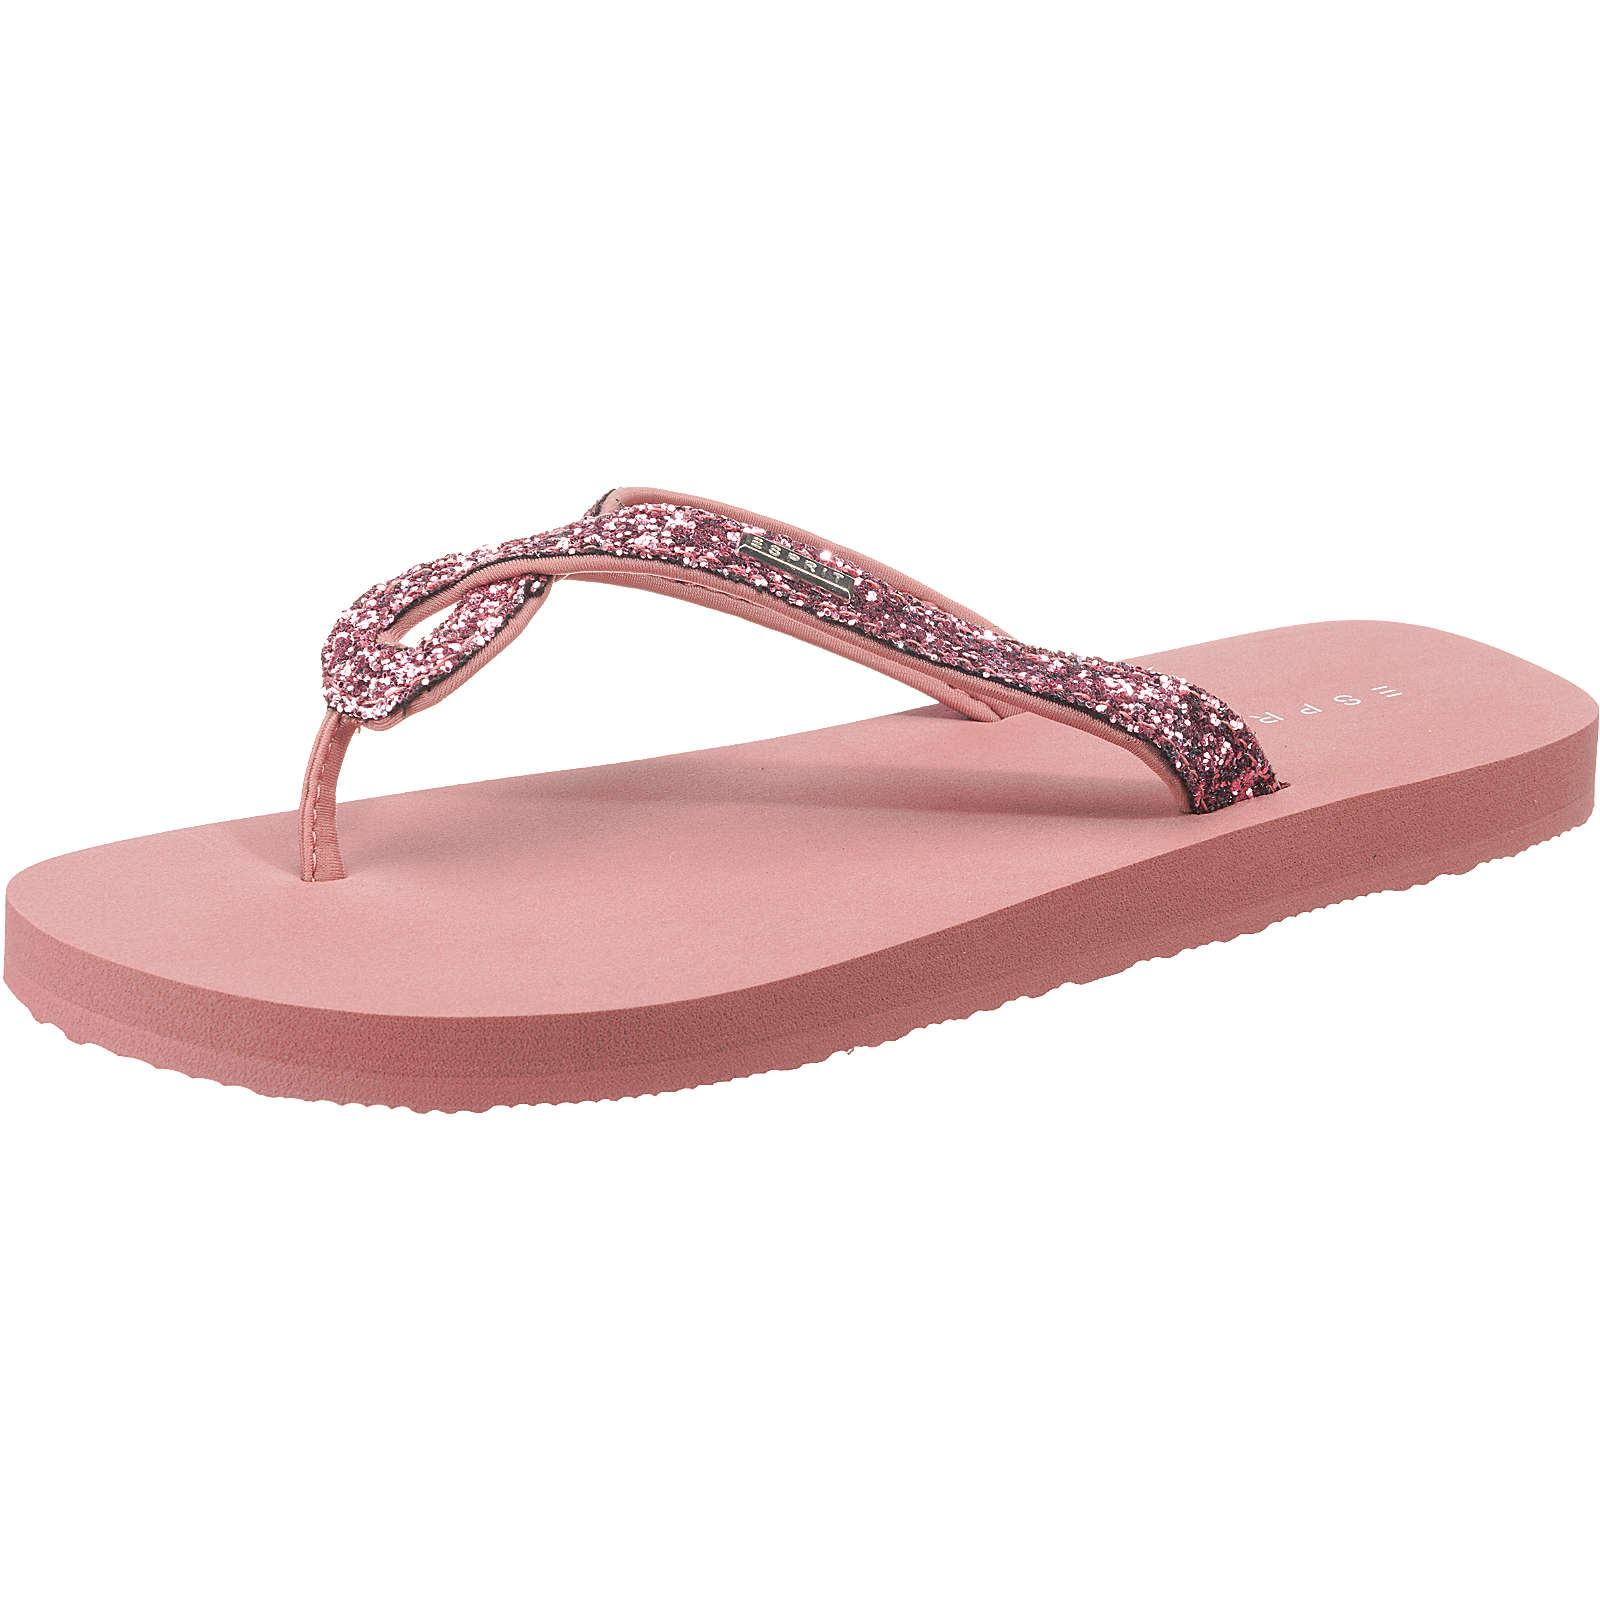 ESPRIT Denise Glitter Pantoletten pink Damen Gr. 36